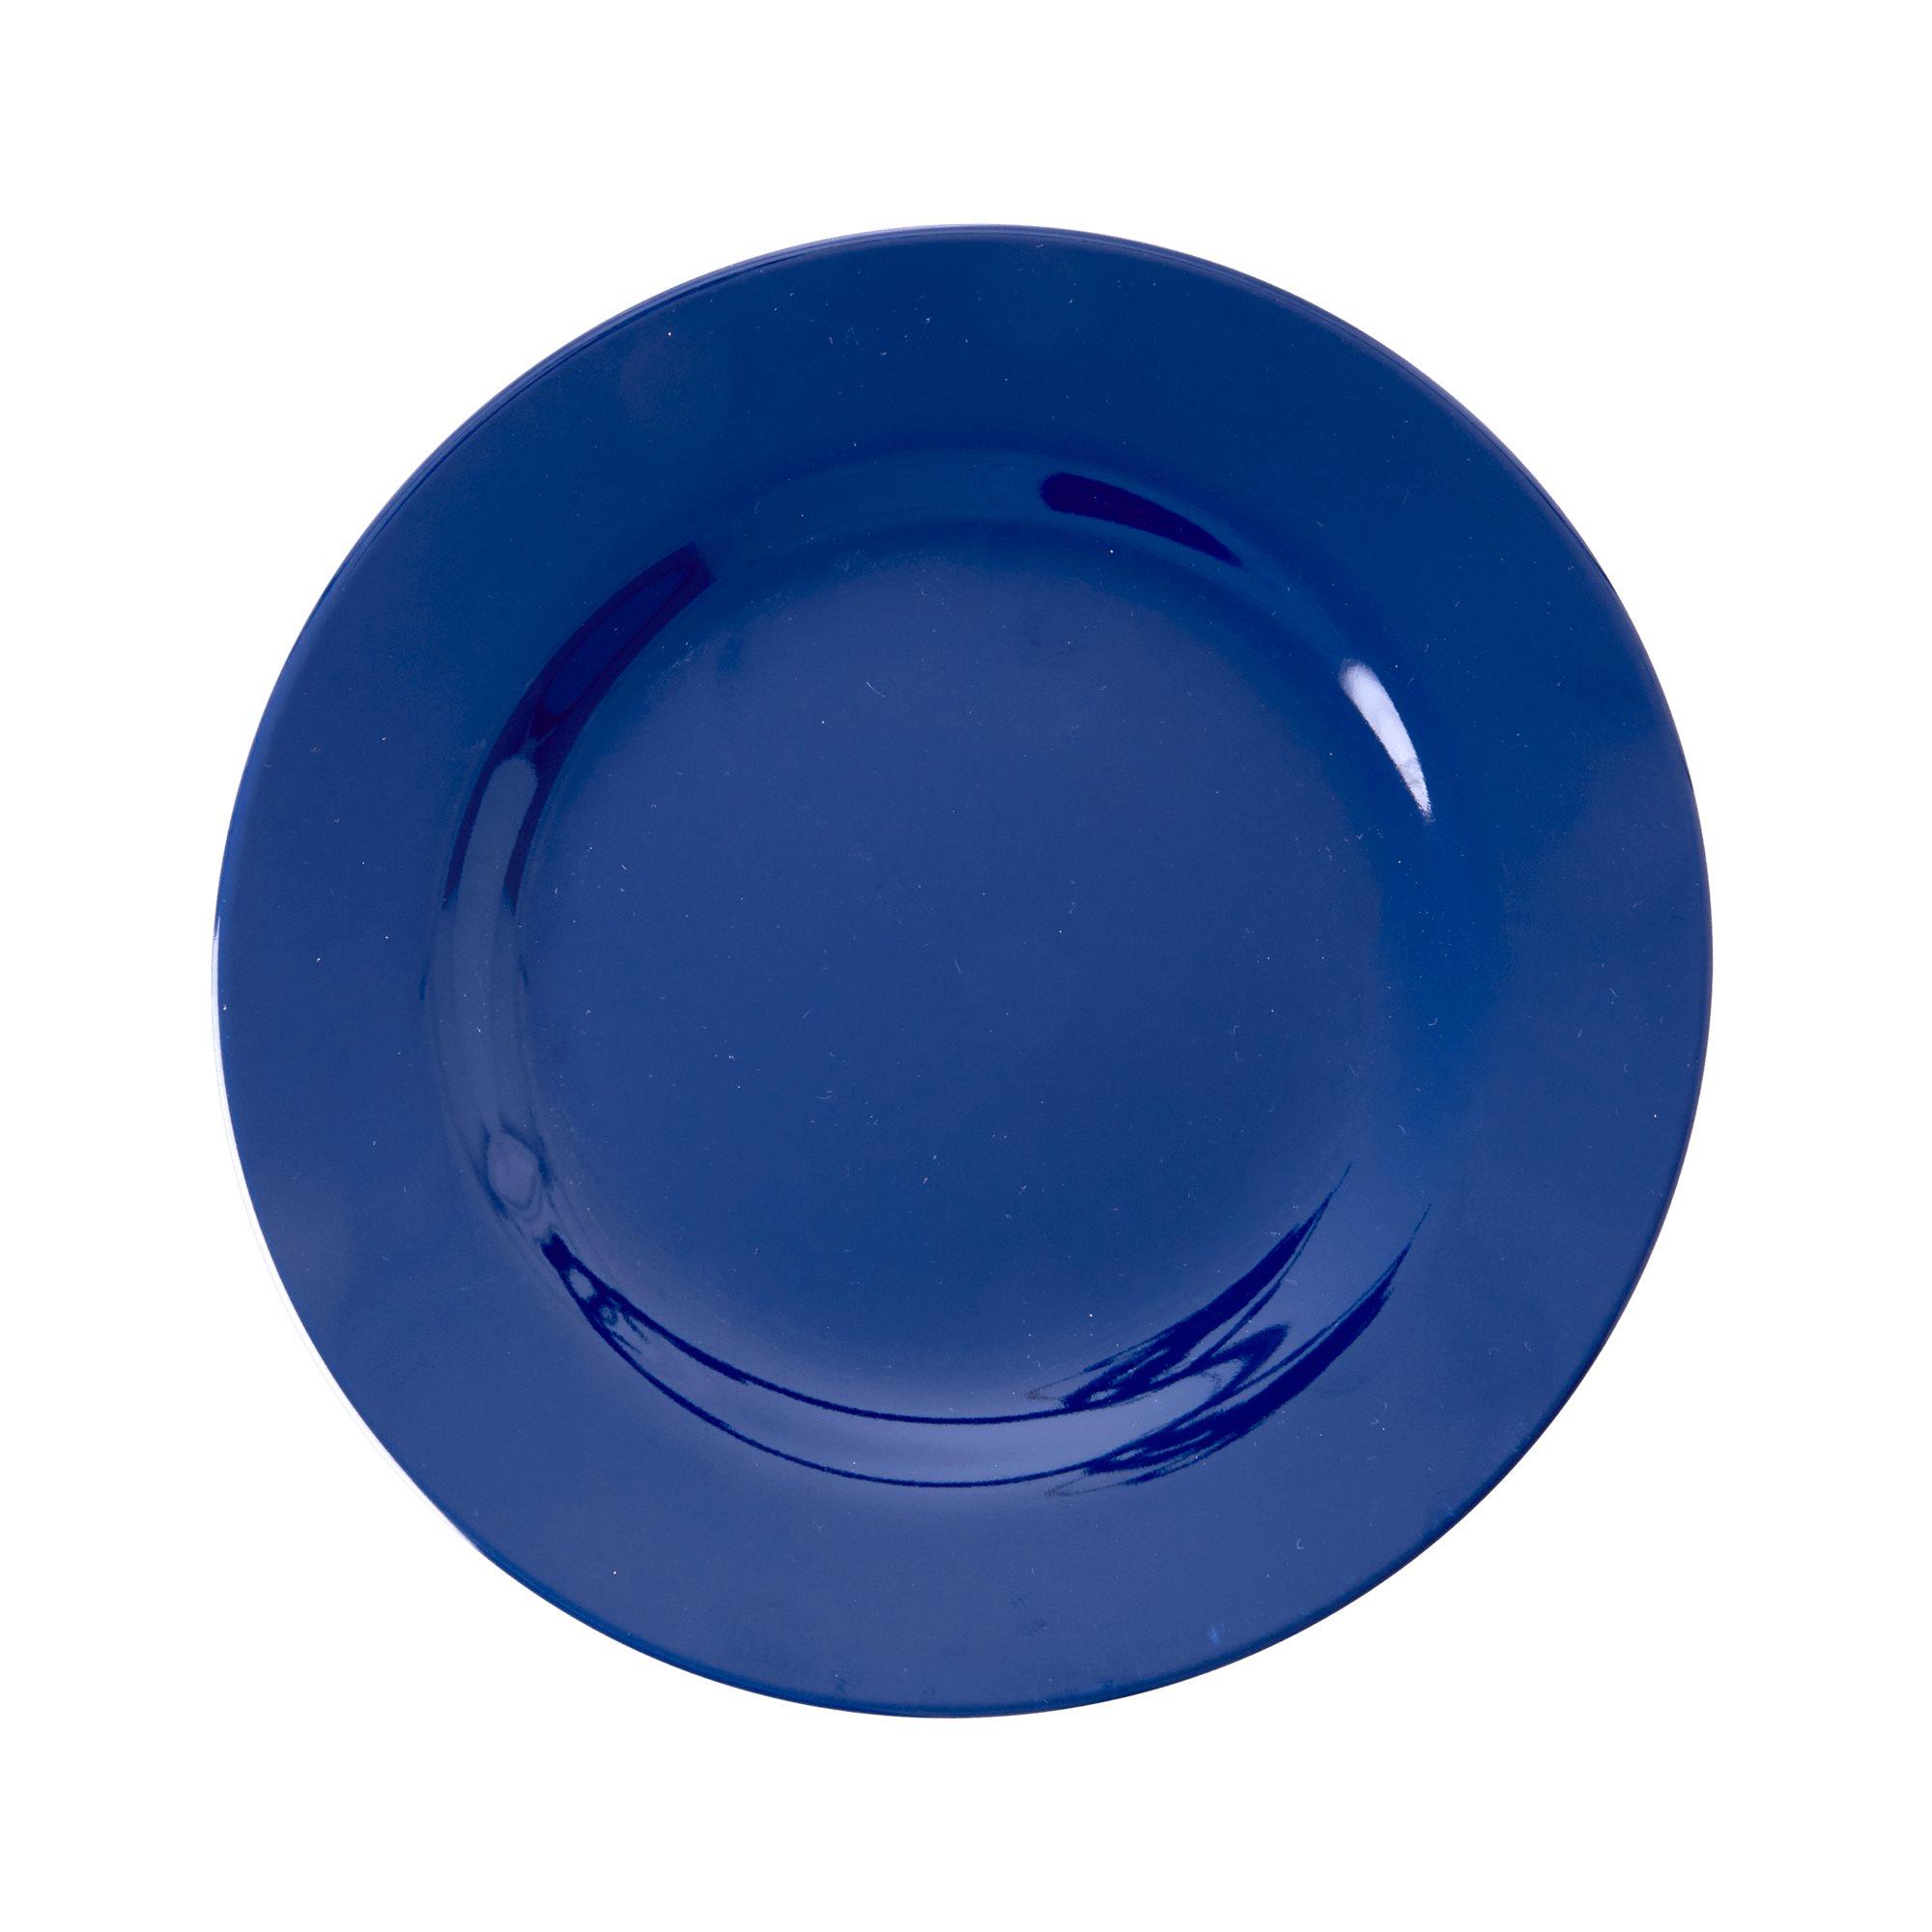 Melamine side plate in Navy Blue